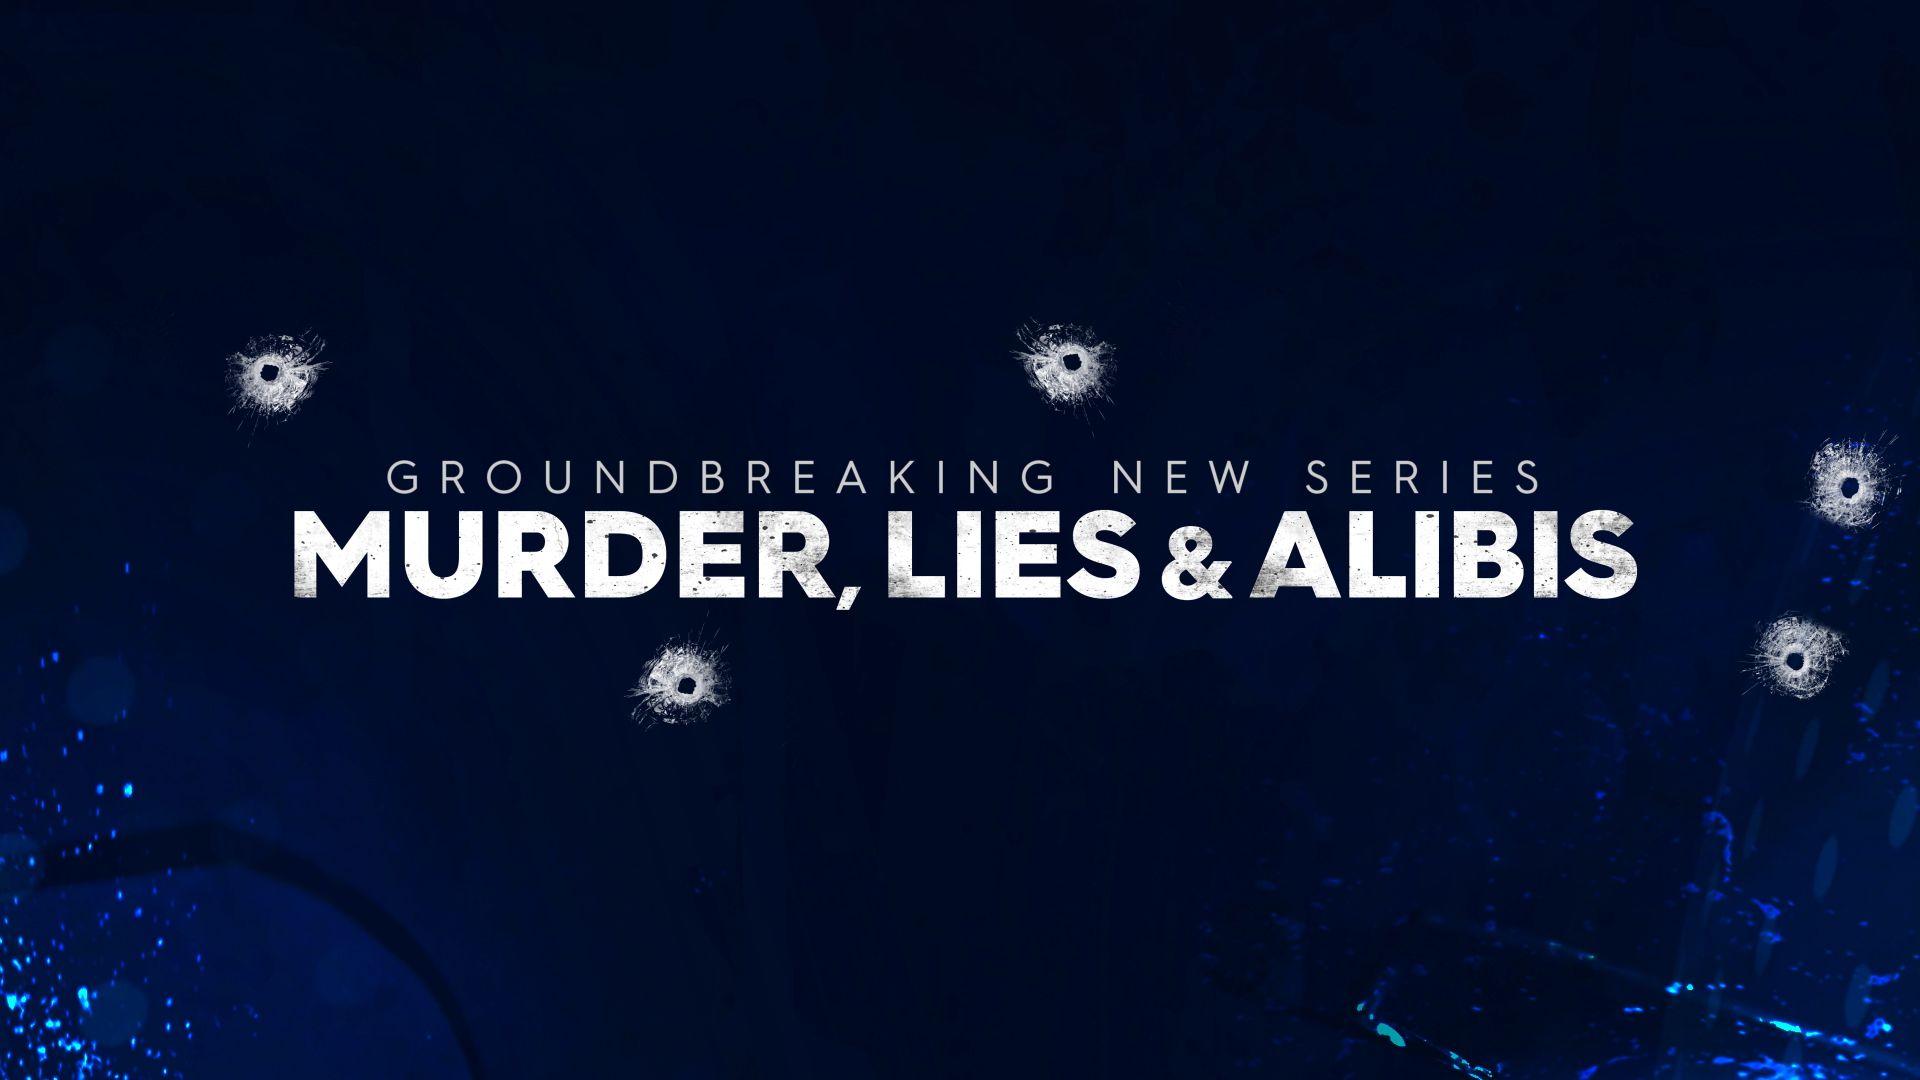 Murder, Lies & Alibis